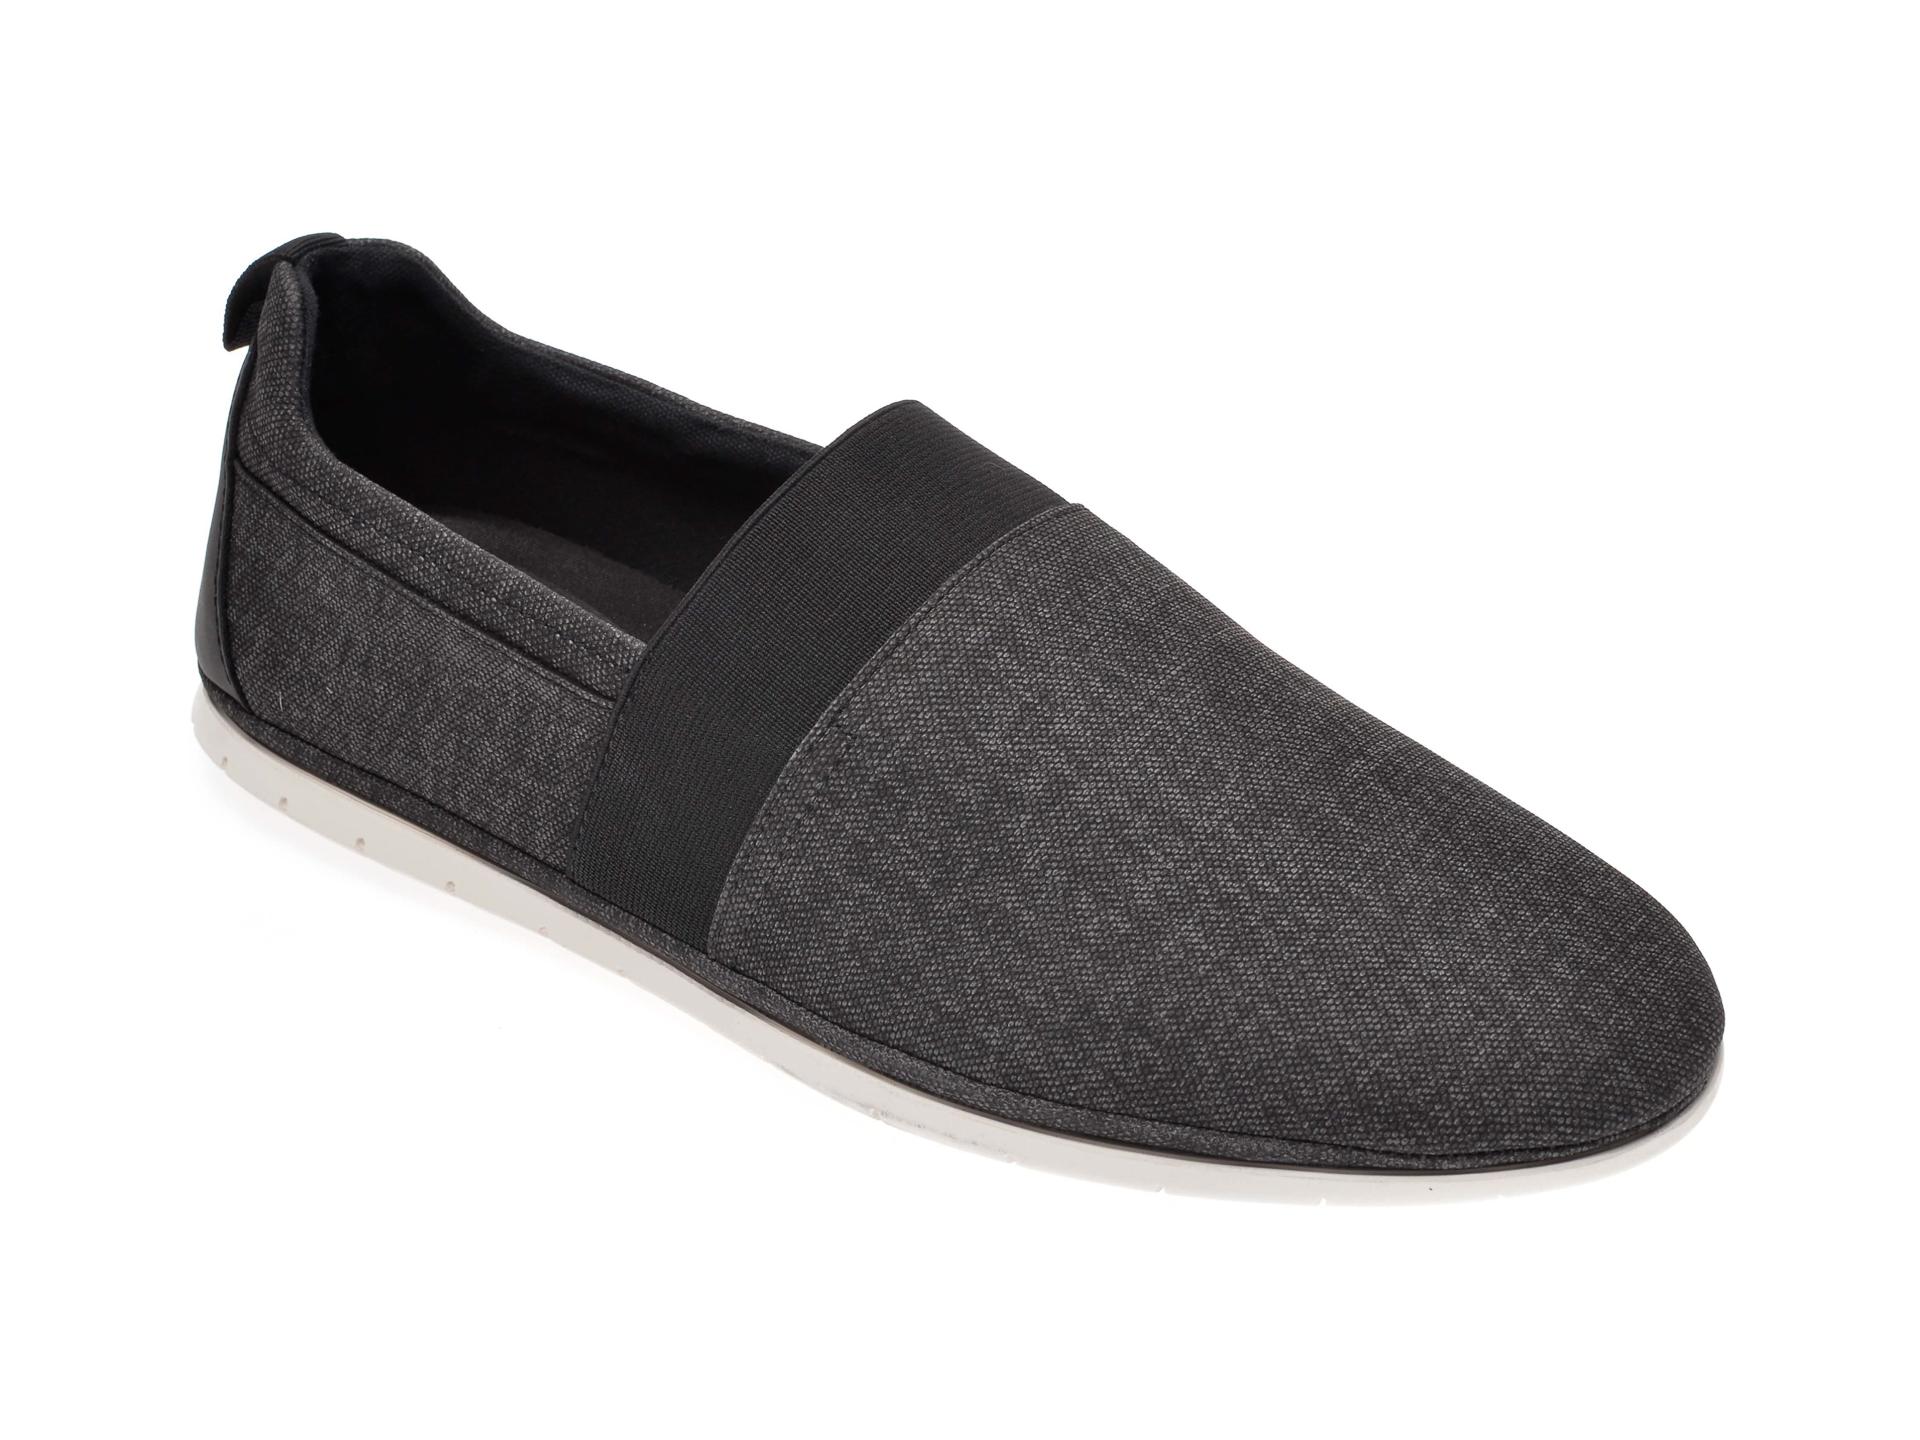 Pantofi ALDO negri, Schoville001, din material textil imagine